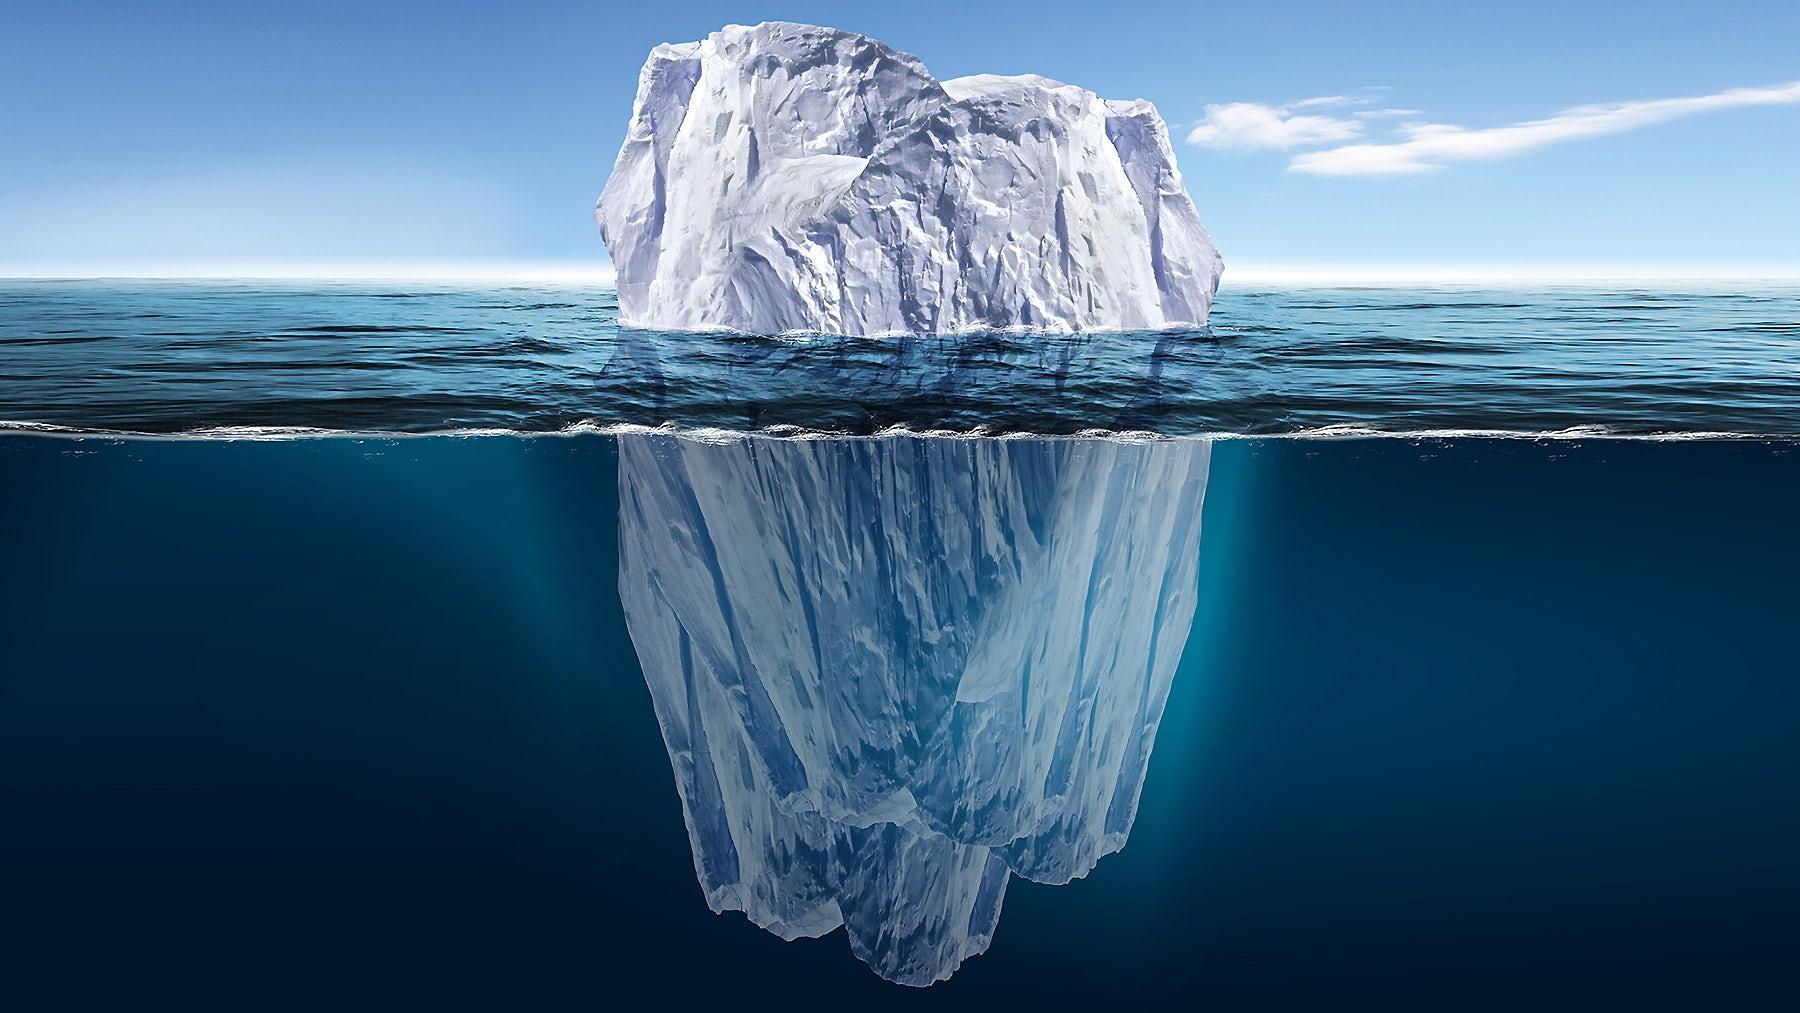 The Digital Iceberg